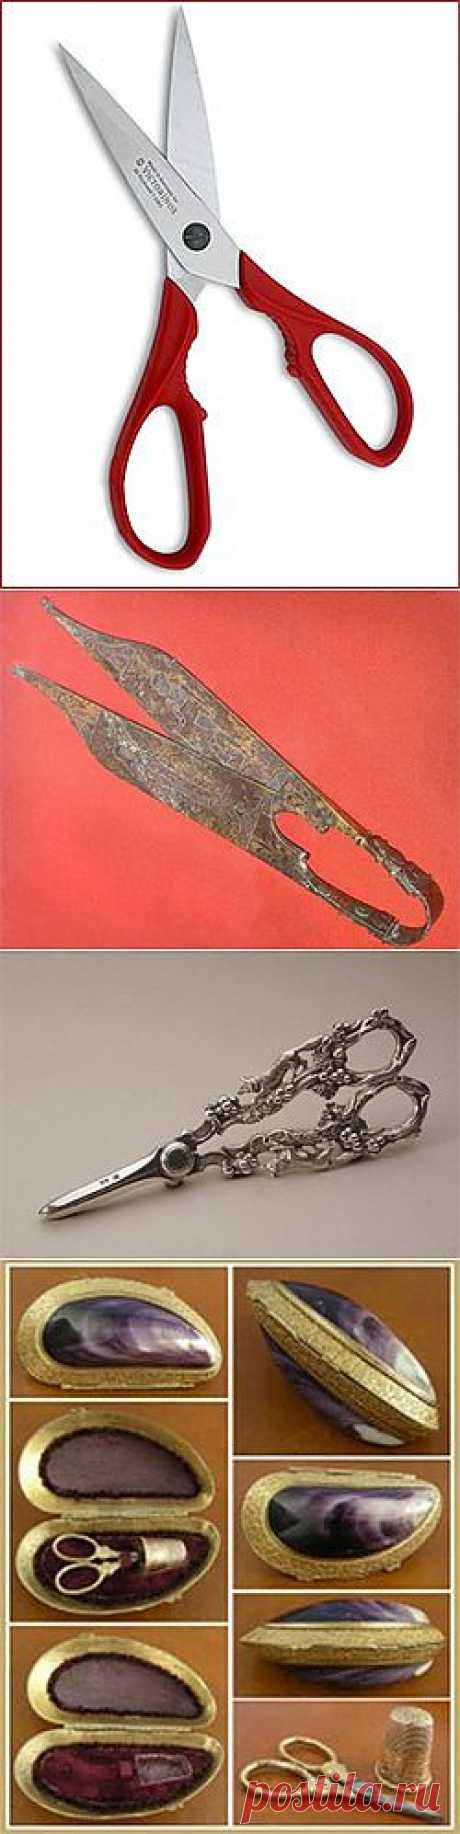 История изобретения ножниц